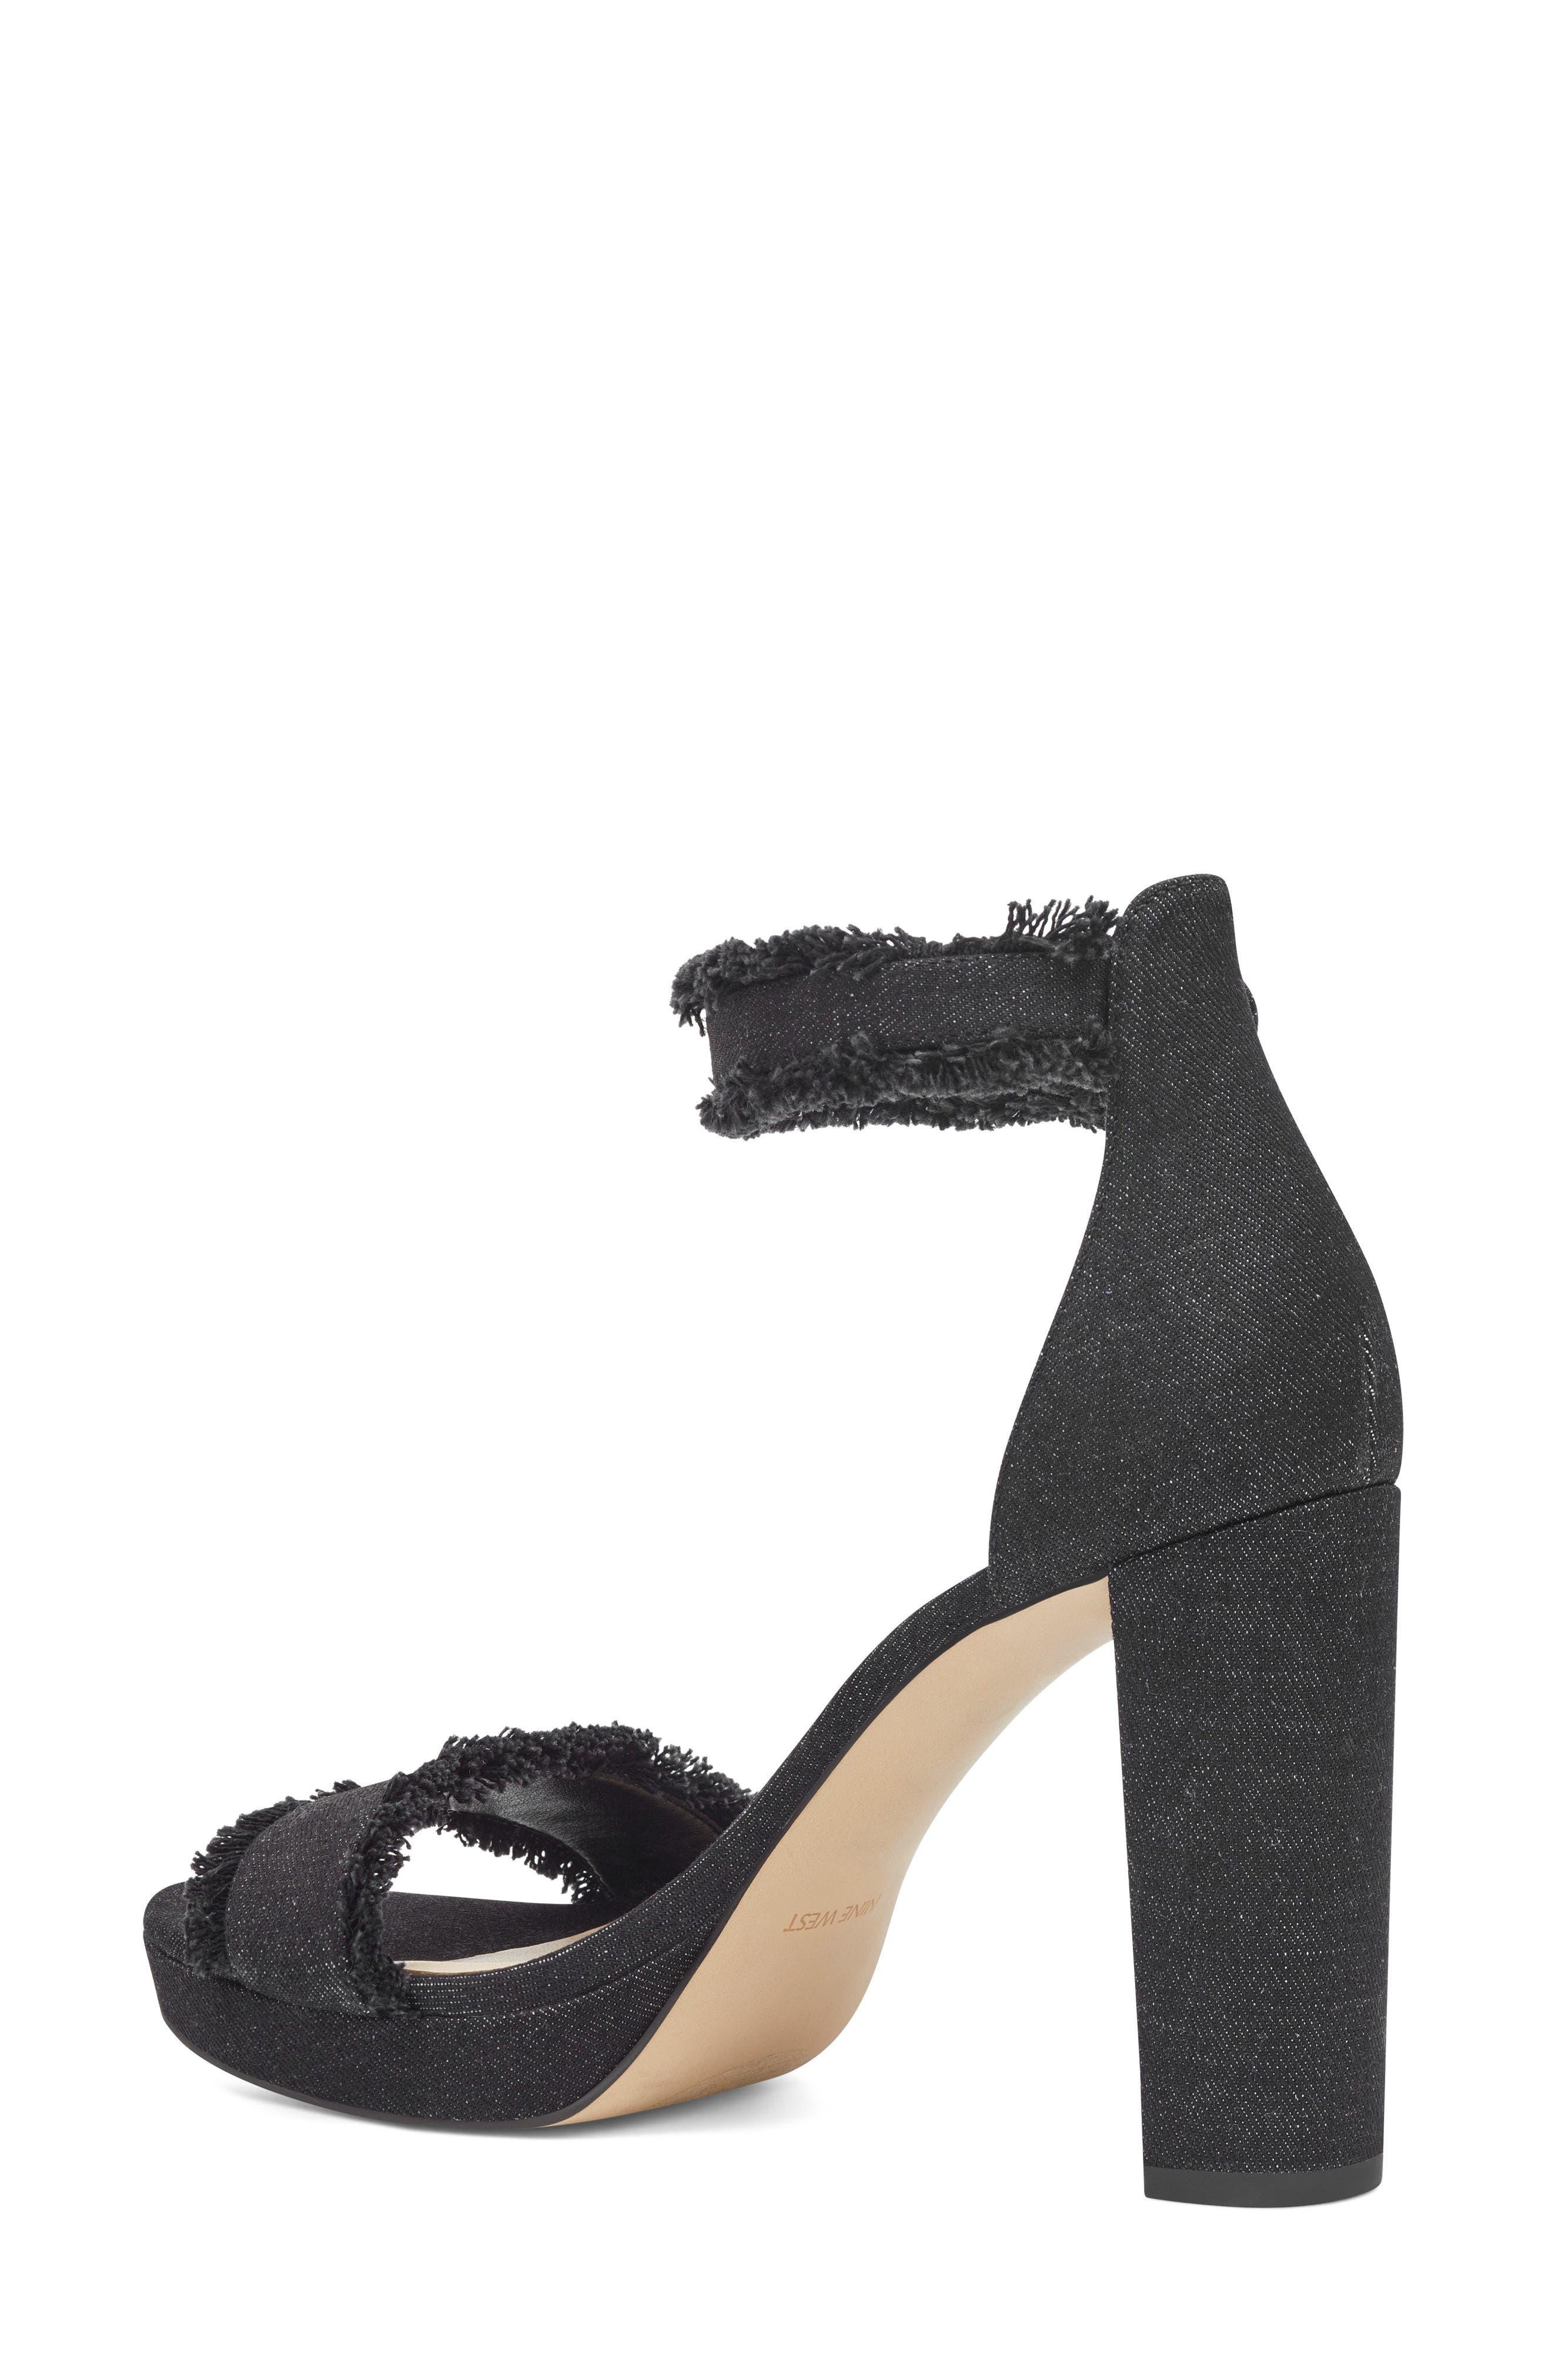 Daranita Ankle Strap Sandal,                             Alternate thumbnail 4, color,